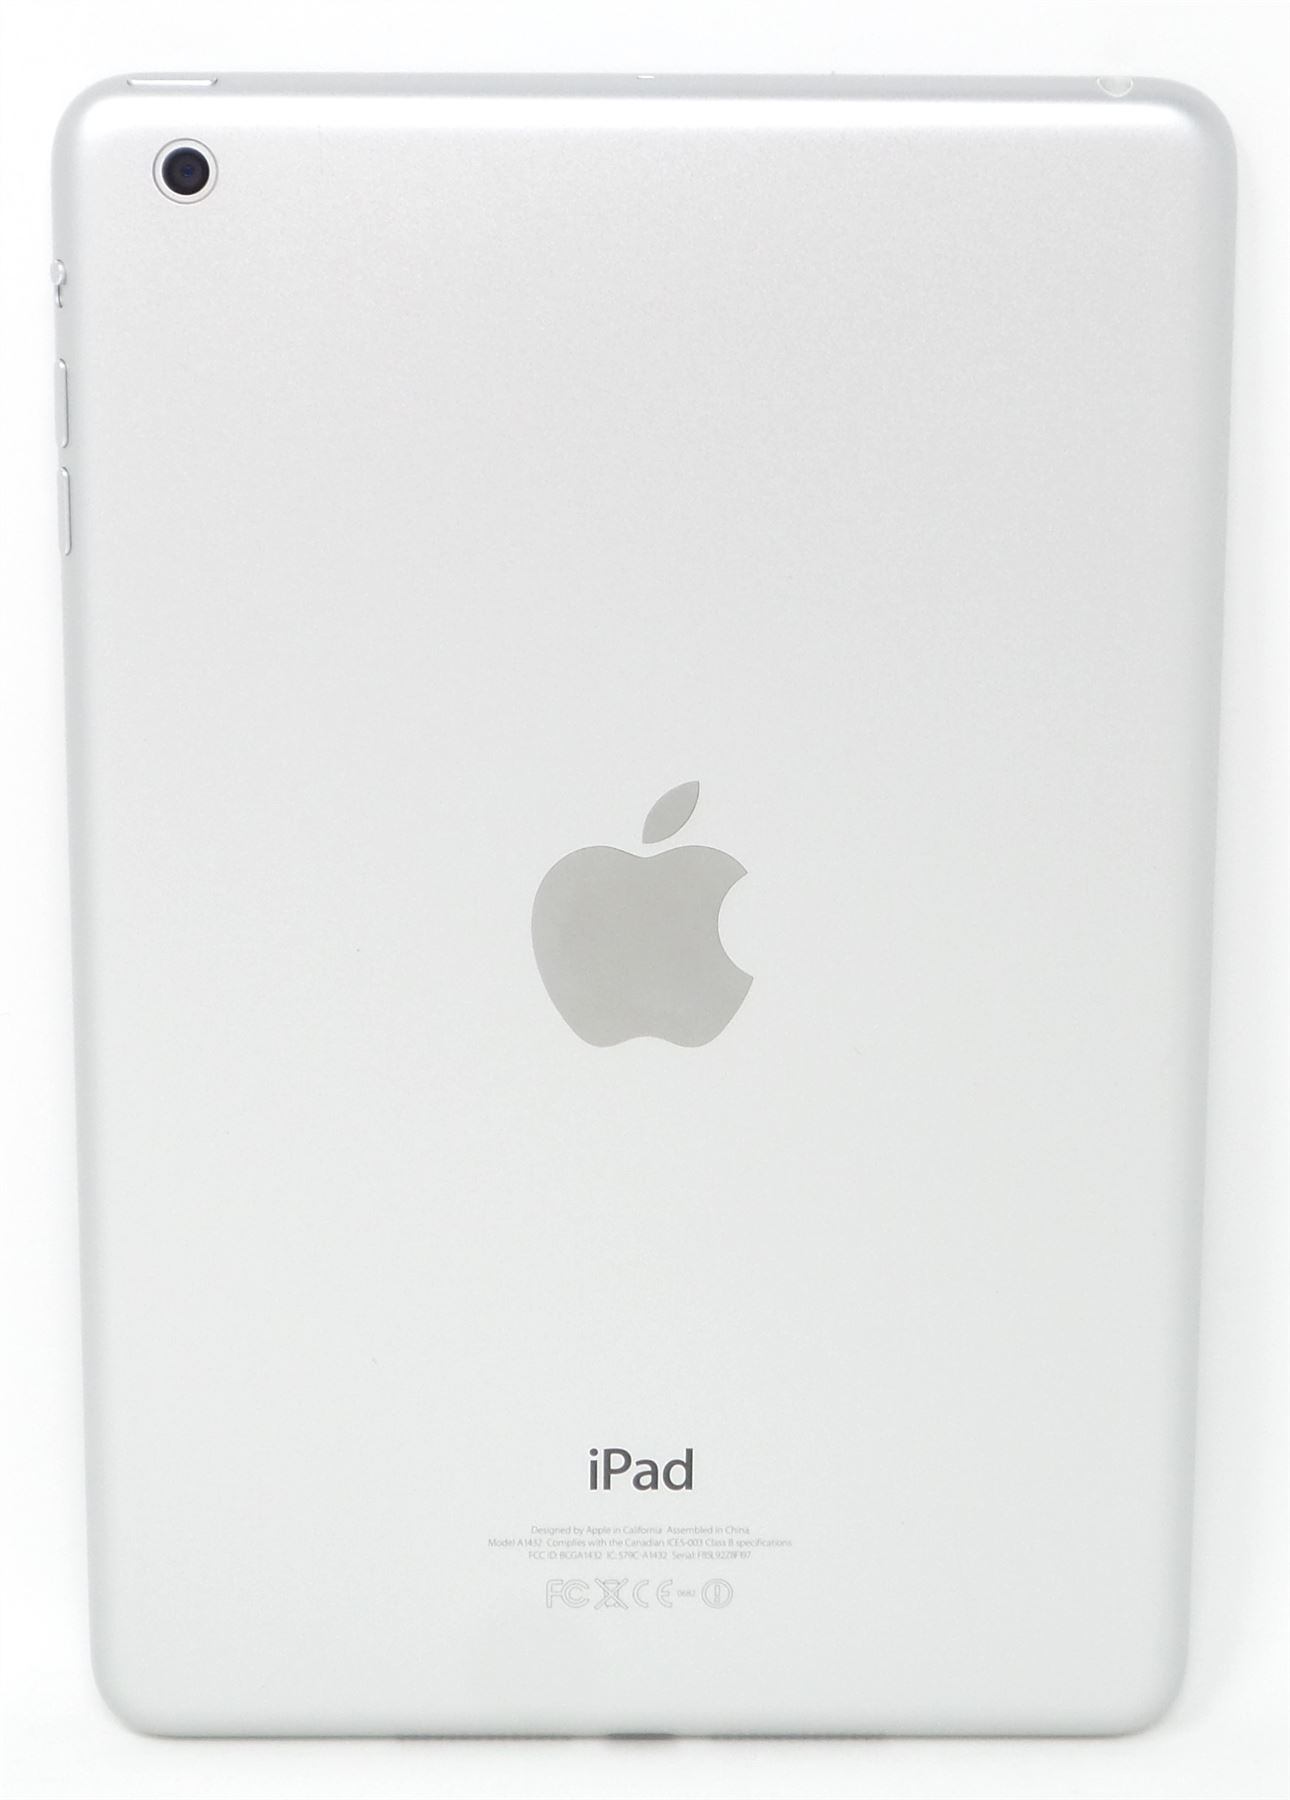 Apple-iPad-mini-1st-Generation-7-9-034-16GB-32GB-64GB-Wi-Fi-Cellular-Black-White thumbnail 10